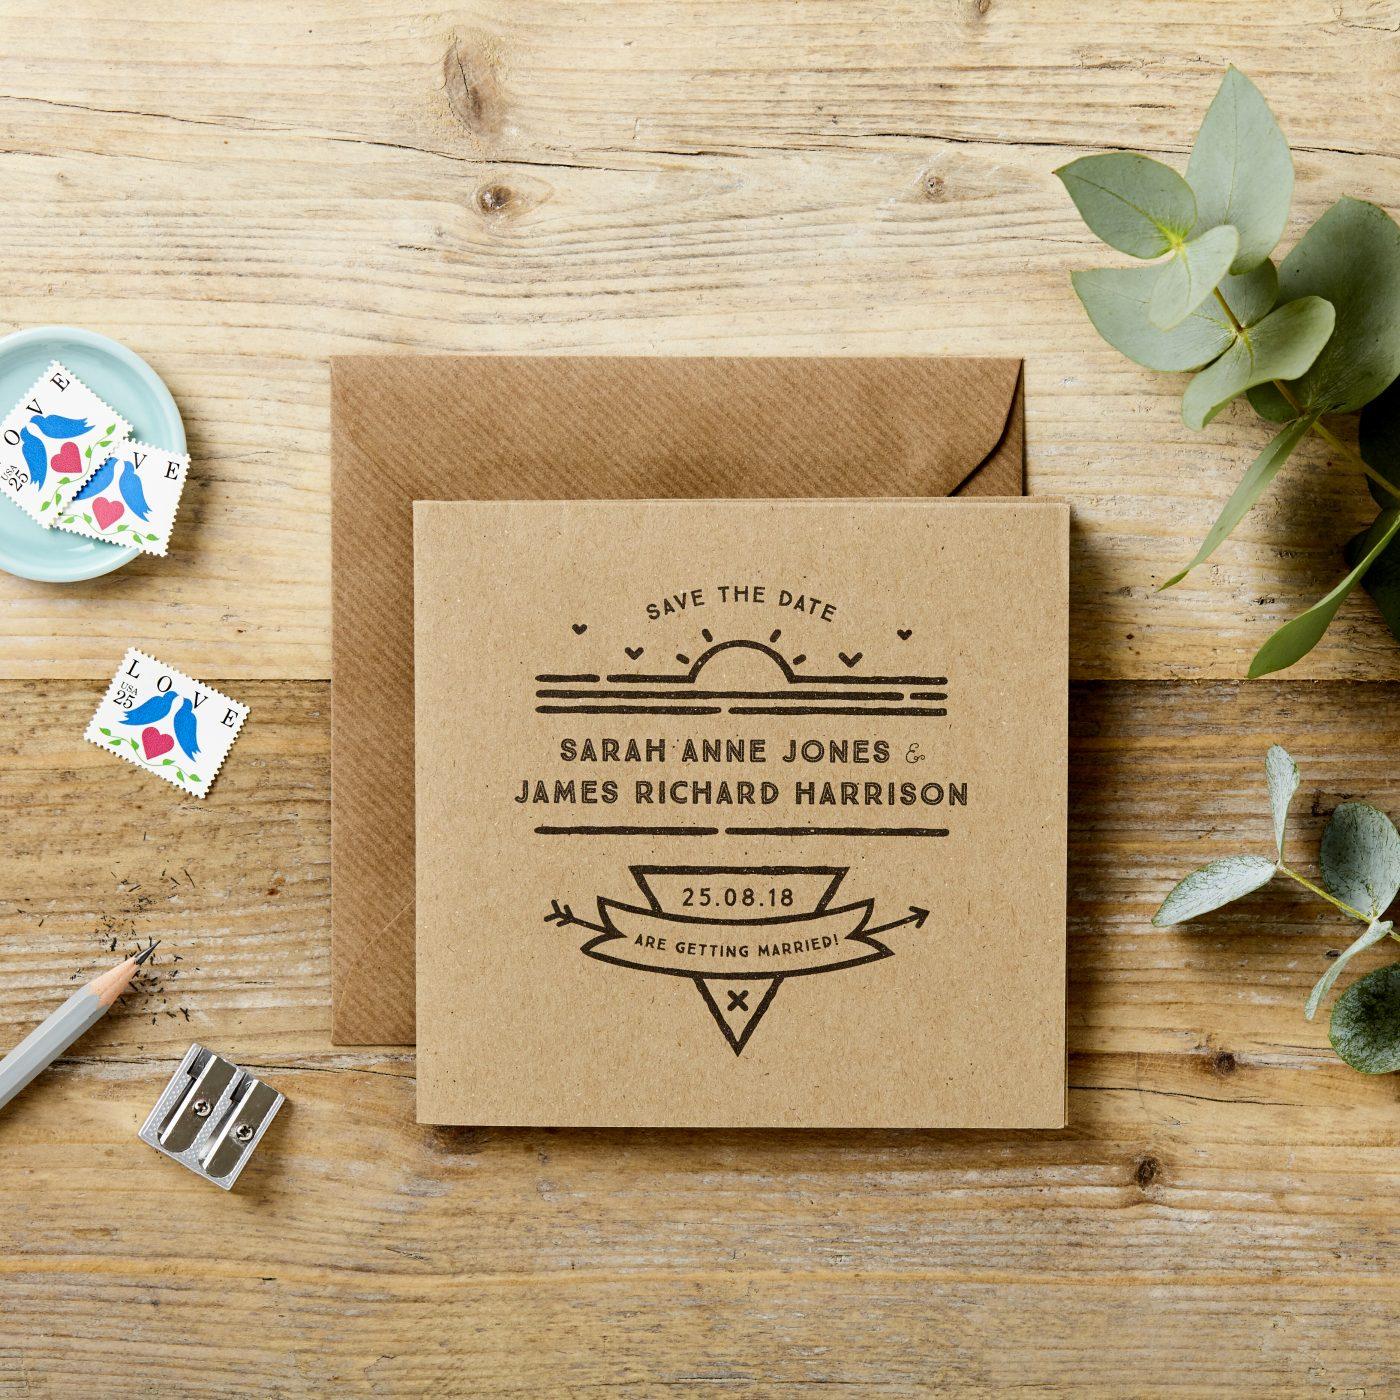 Rustic Foldout Wedding Invitation Poster doodlelove